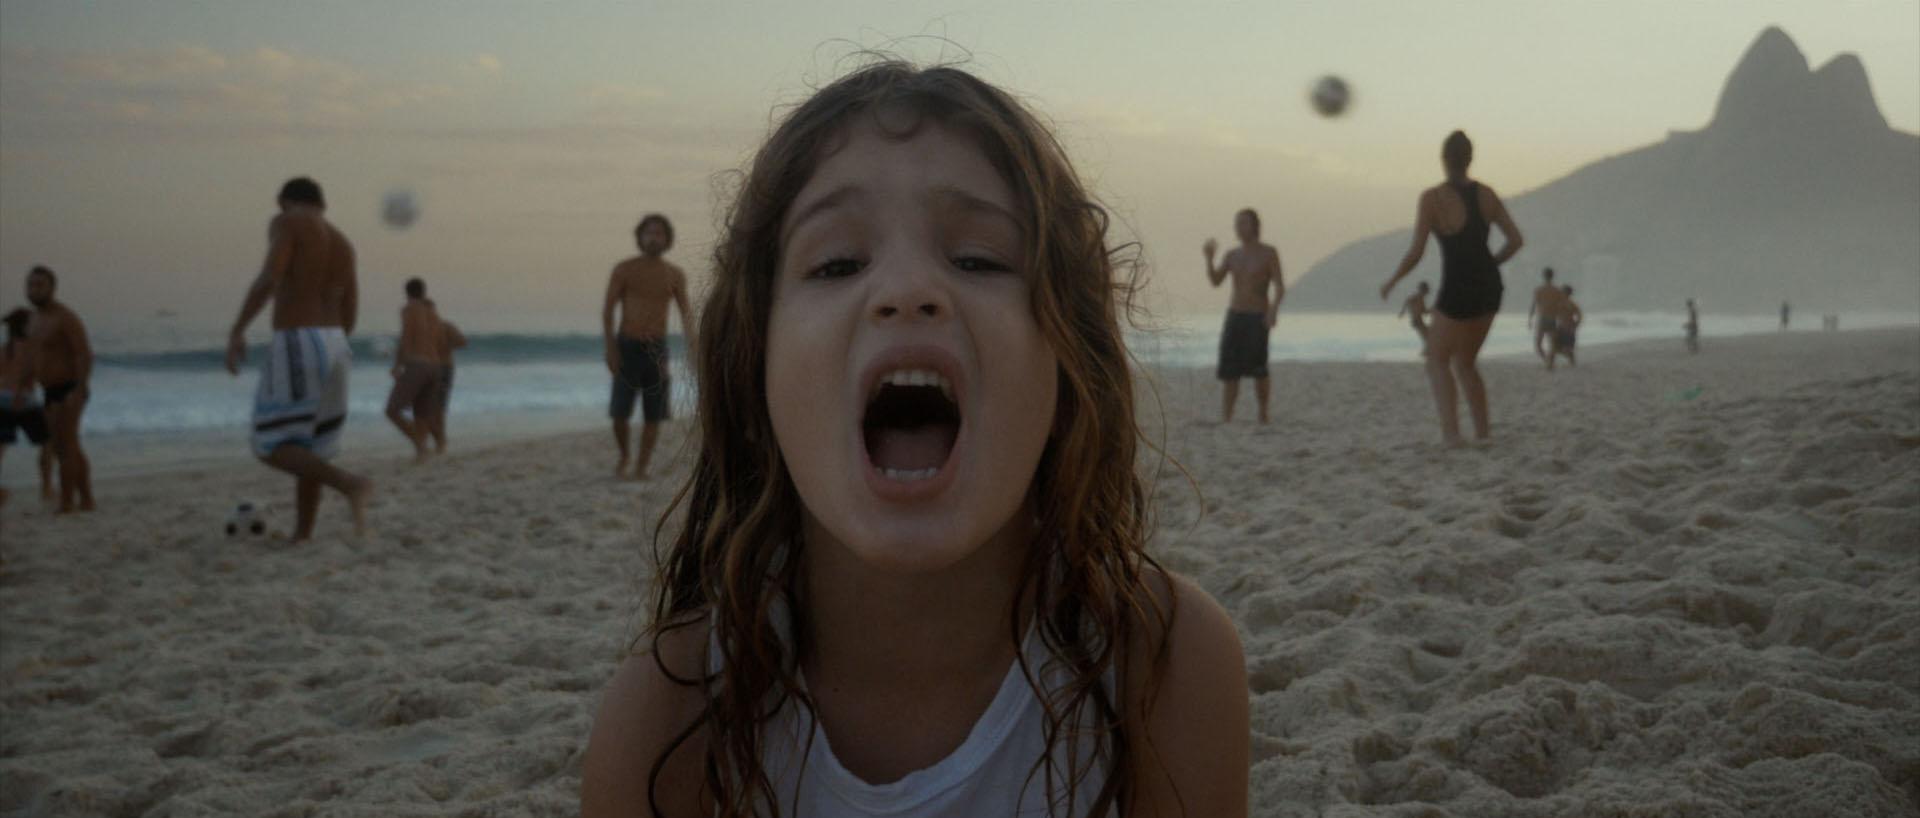 Altinho-Still-girlSinging2